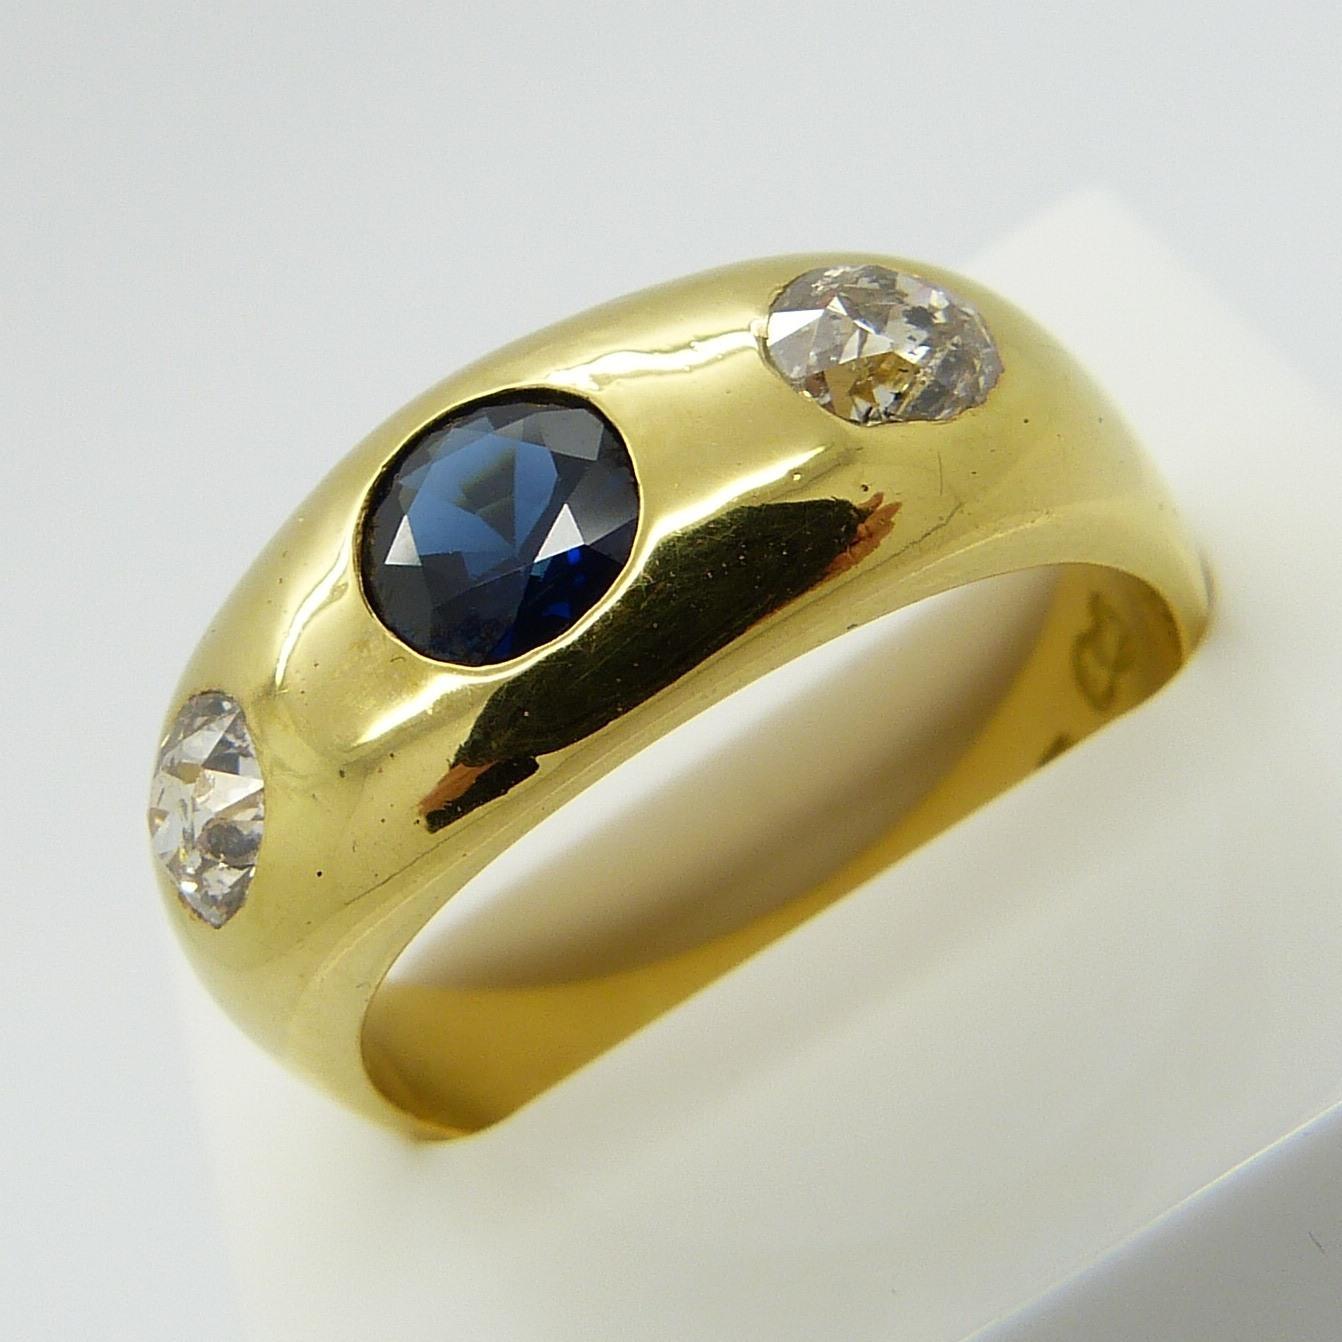 9fcd58d119e28 VICTORIAN SAPPHIRE & DIAMOND RING. Jewellery & Gemstones - Rings ...